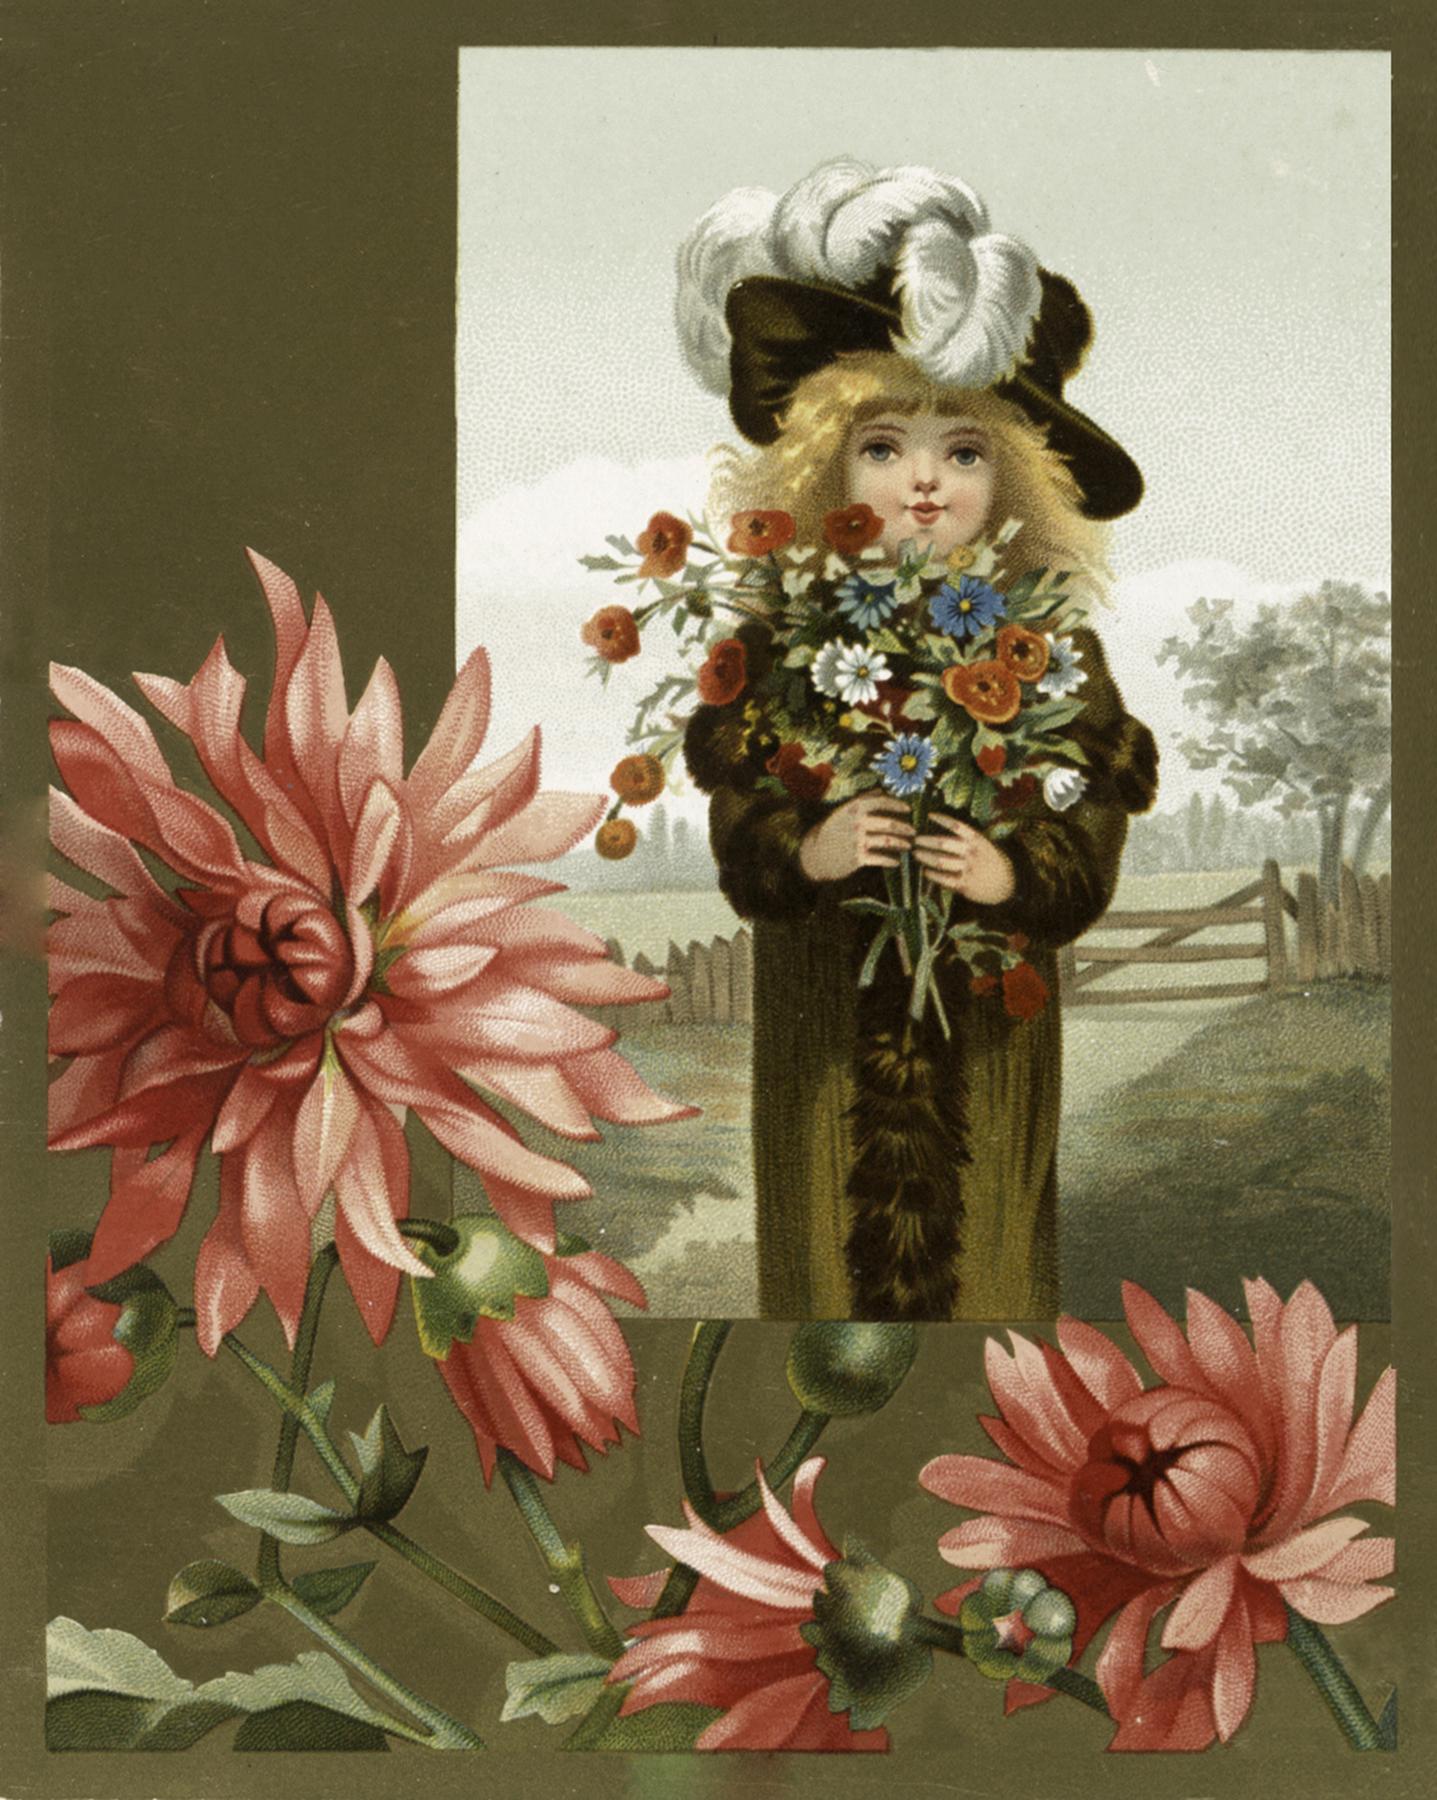 Vintage Girl Holding Flowers image